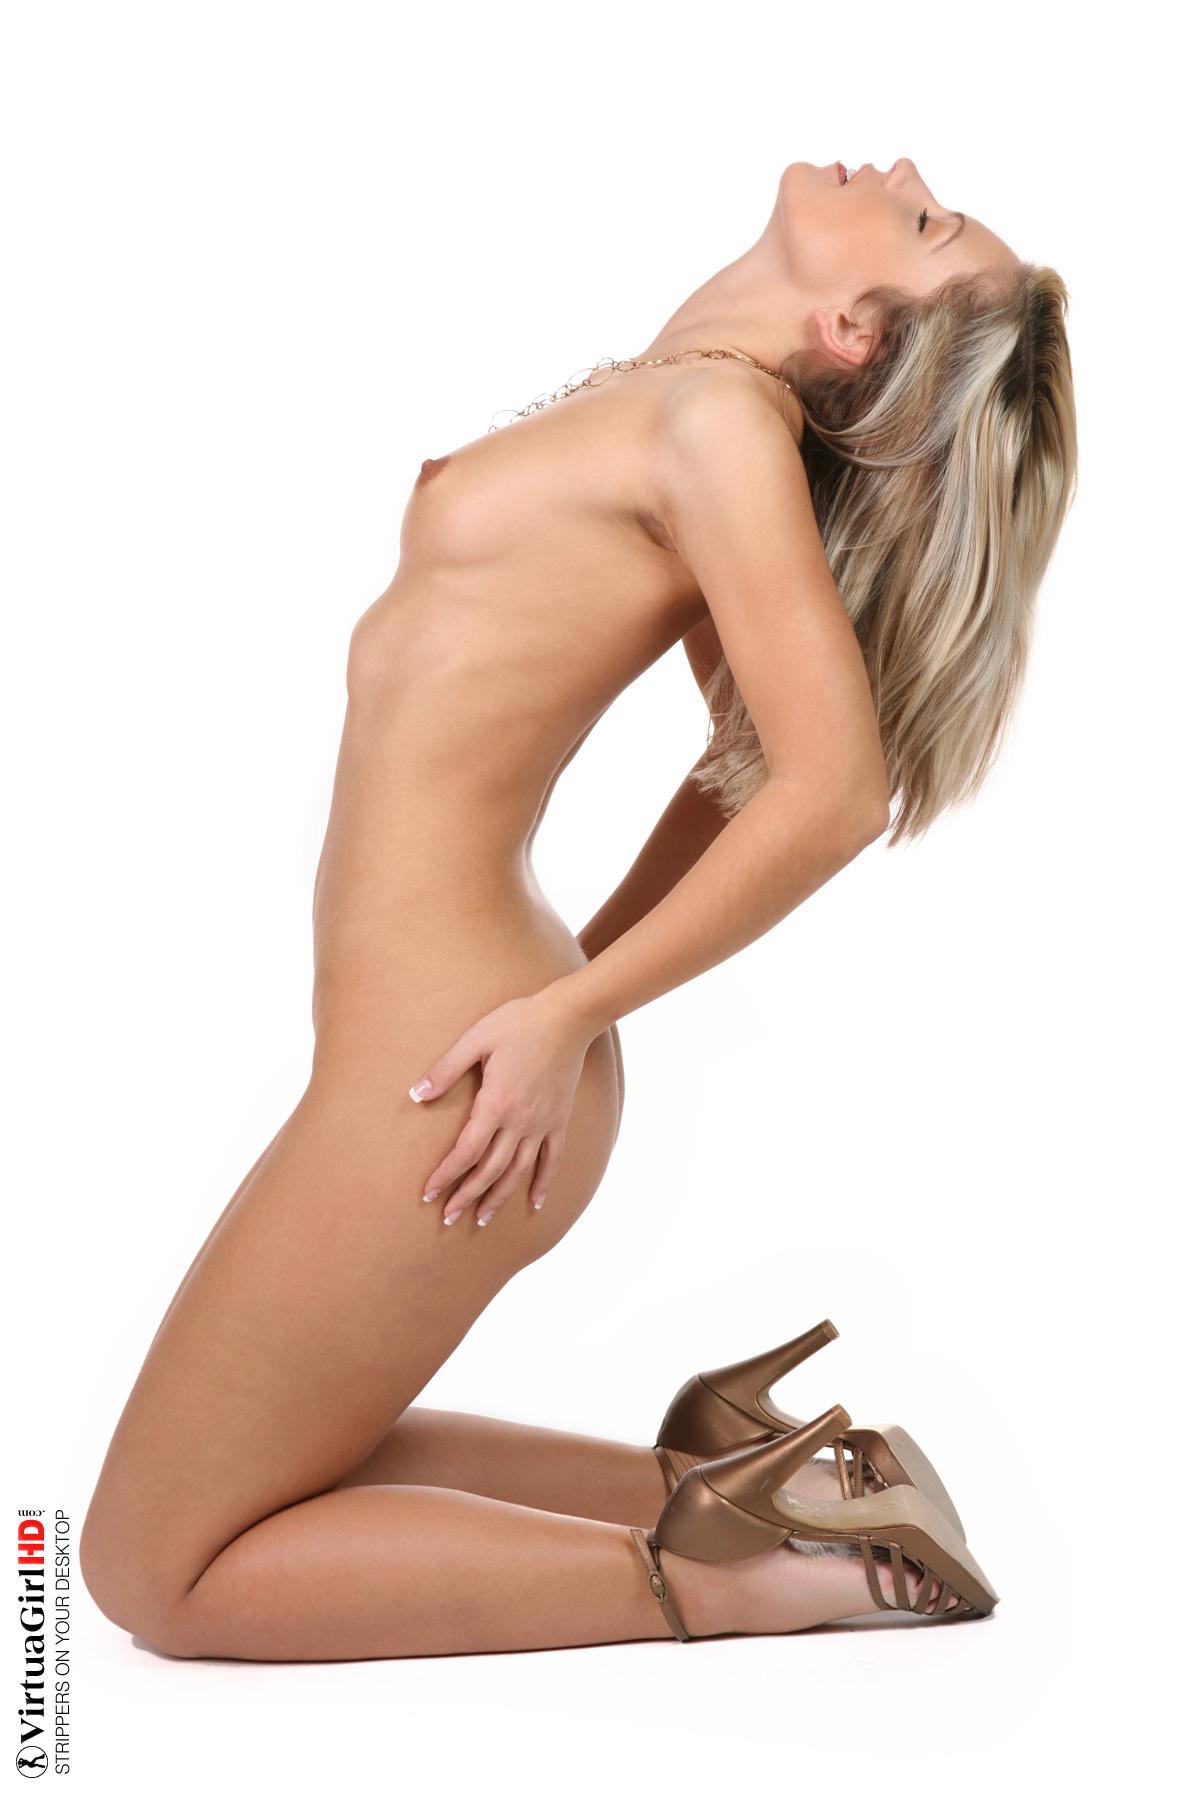 sexy women hd wallpapers